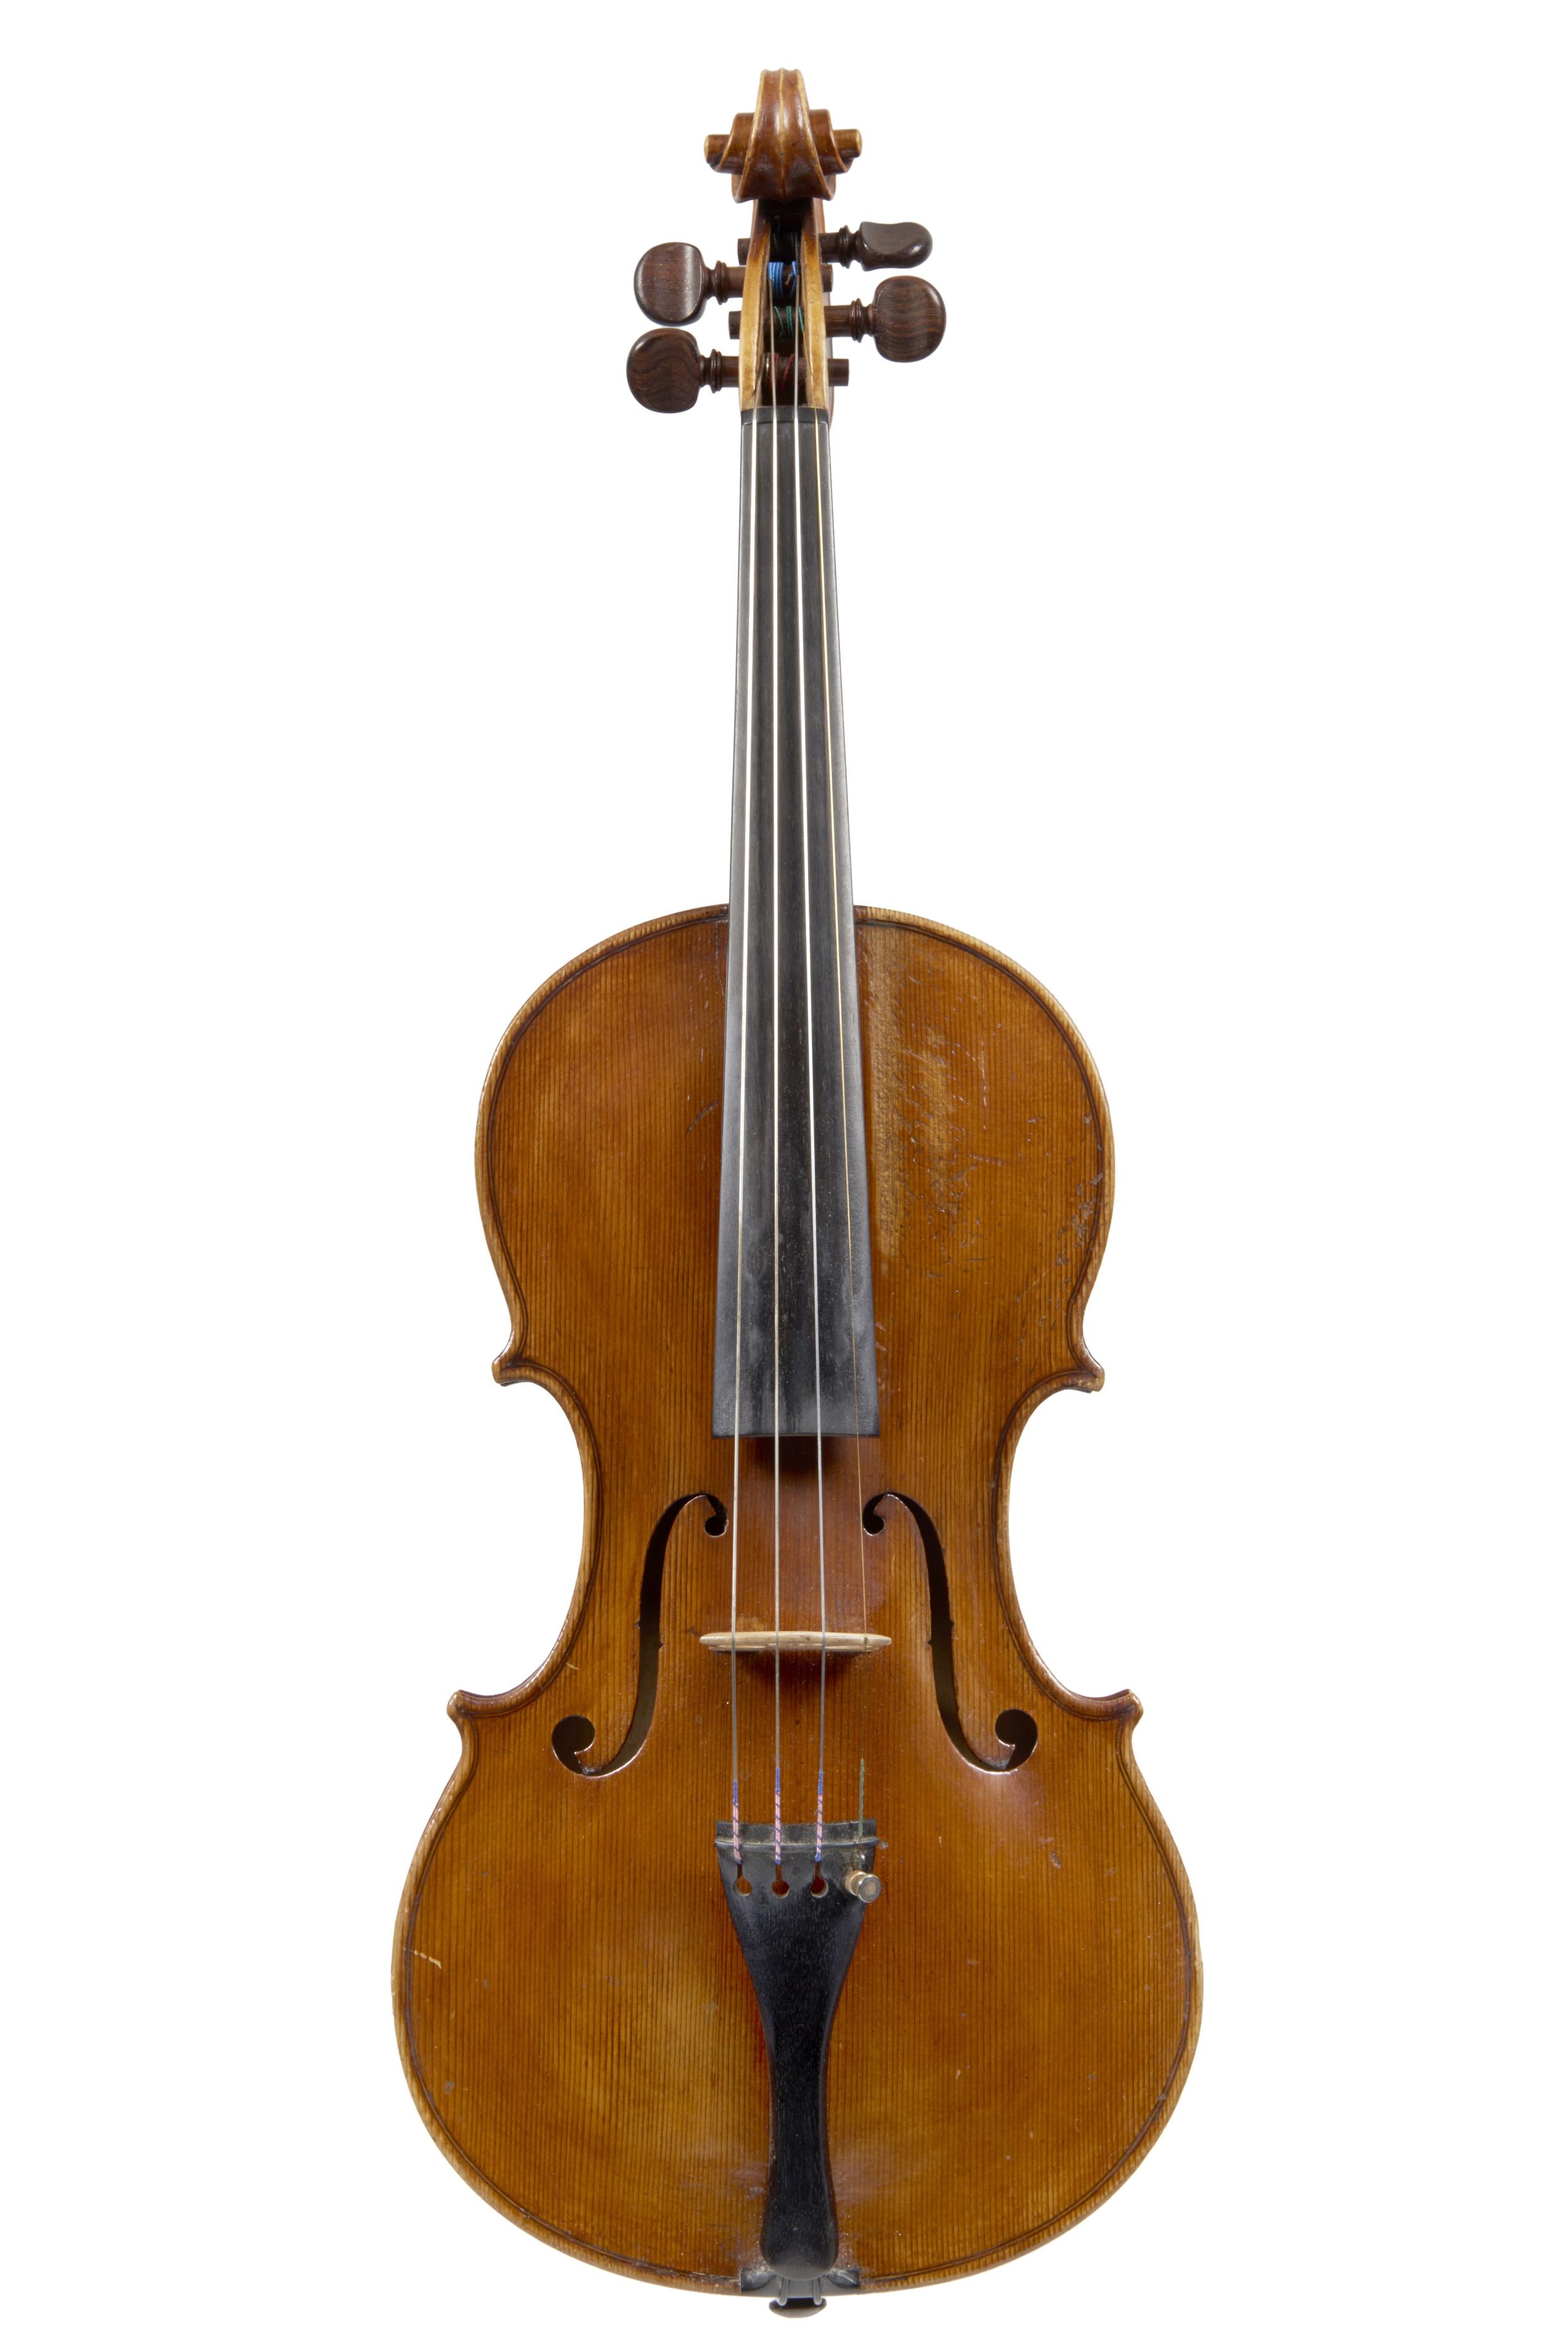 PROBABLY BY GIUSEPPE SGARBI (b Finale Emilia, 1818; d Modena, 1905) A VIOLIN MODENA SECOND HALF OF - Image 2 of 3